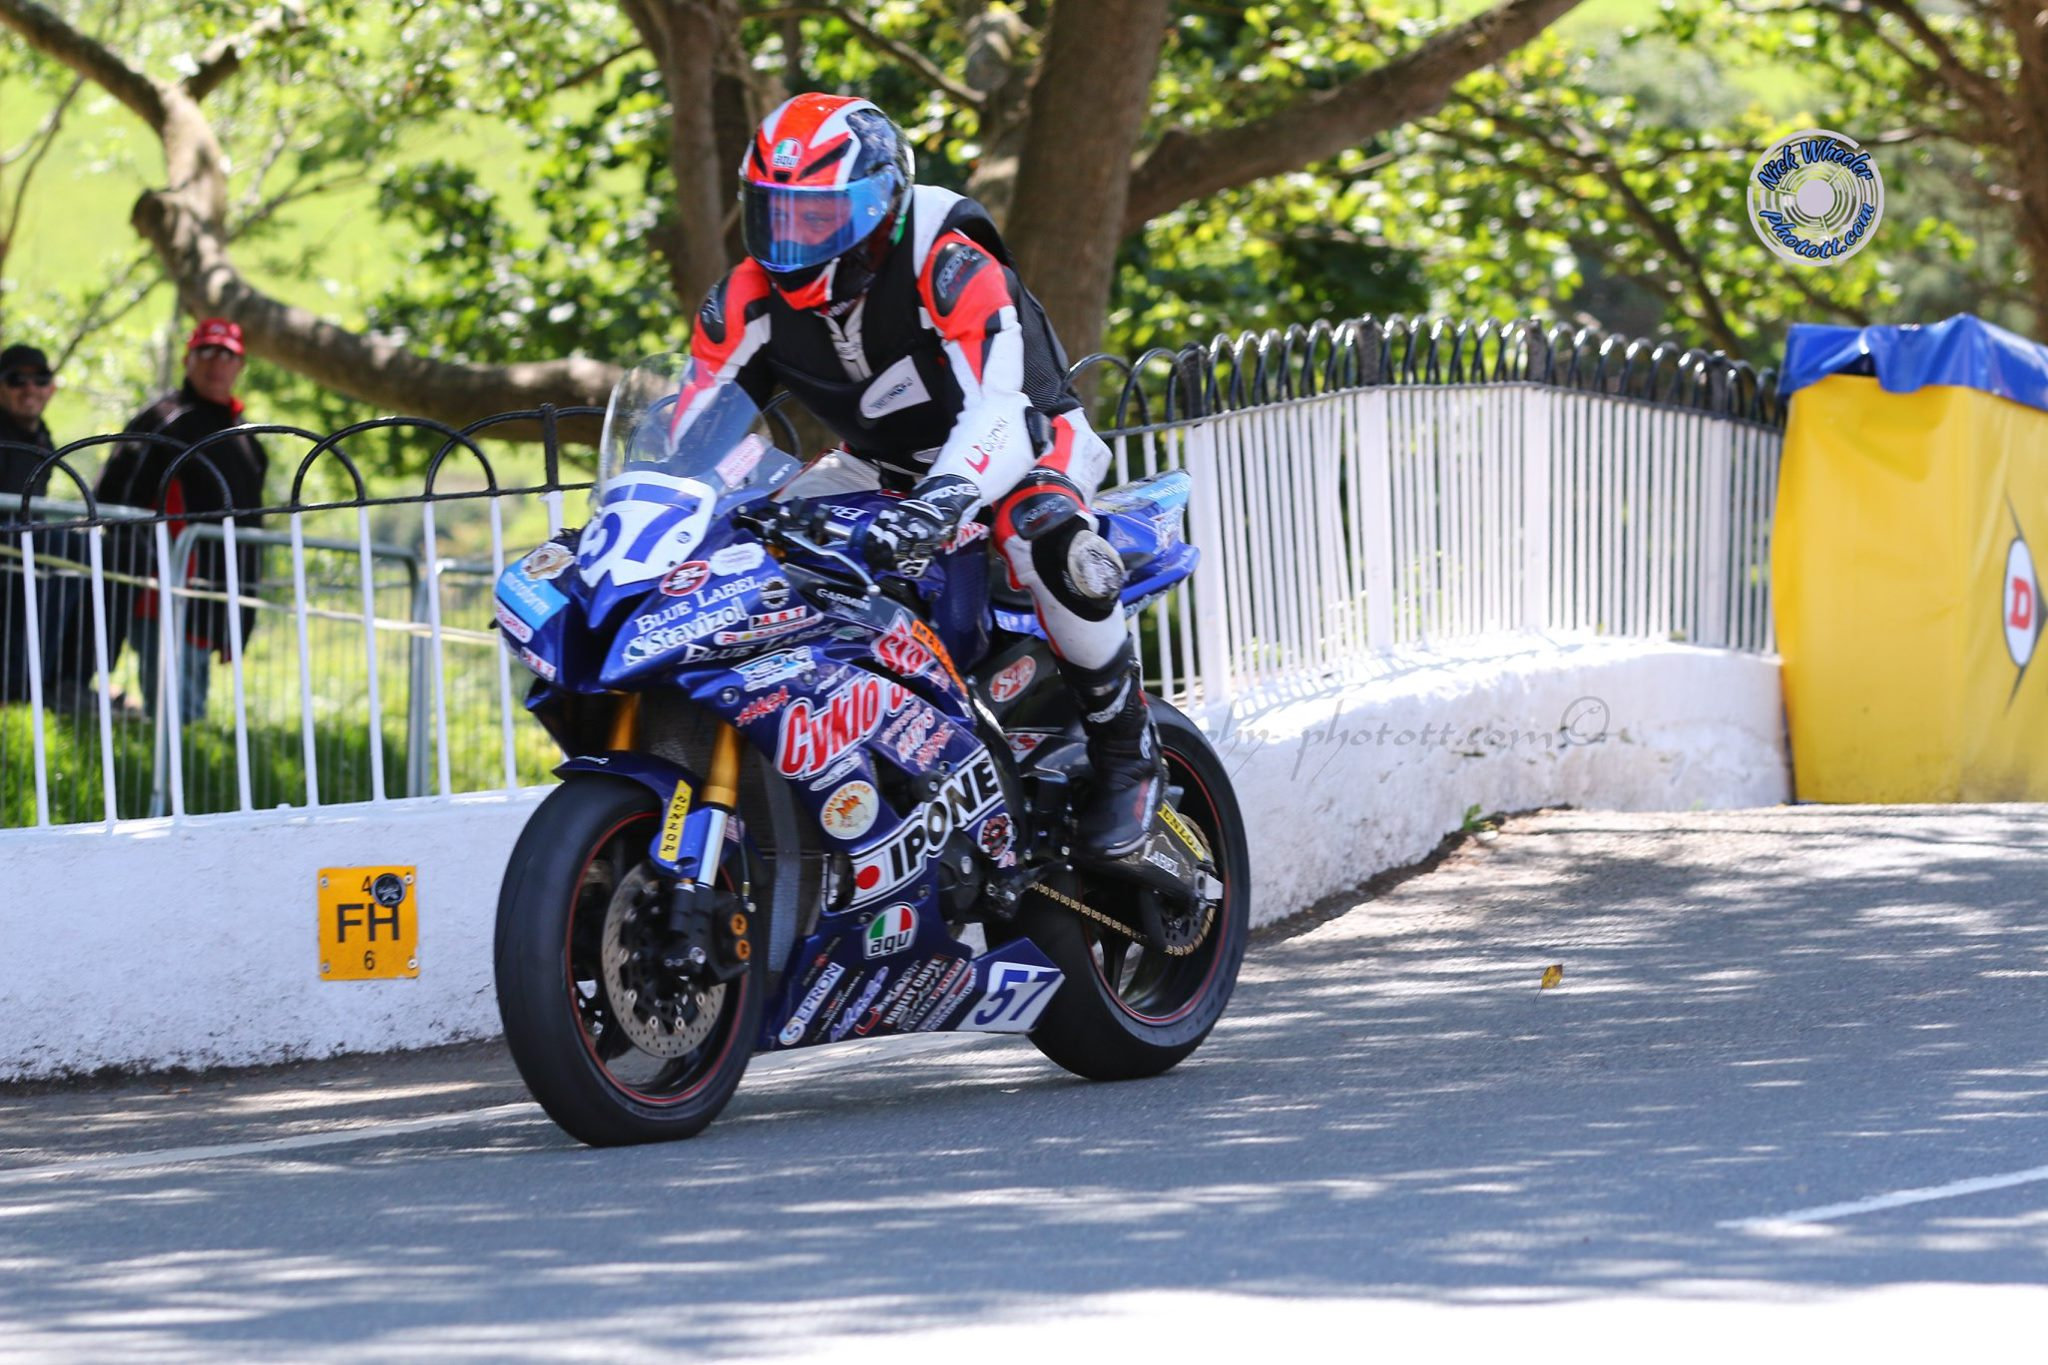 Manx GP Top 6: Miroslav Sloboda